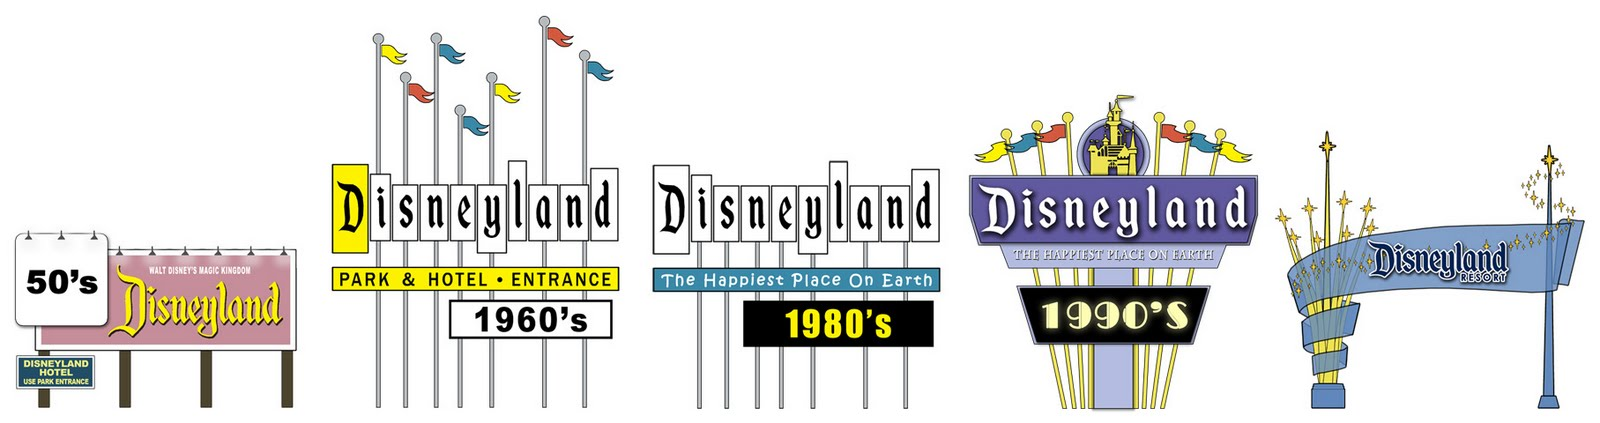 Disneyland California Re(P)ort: Disneyland Sign 2000s